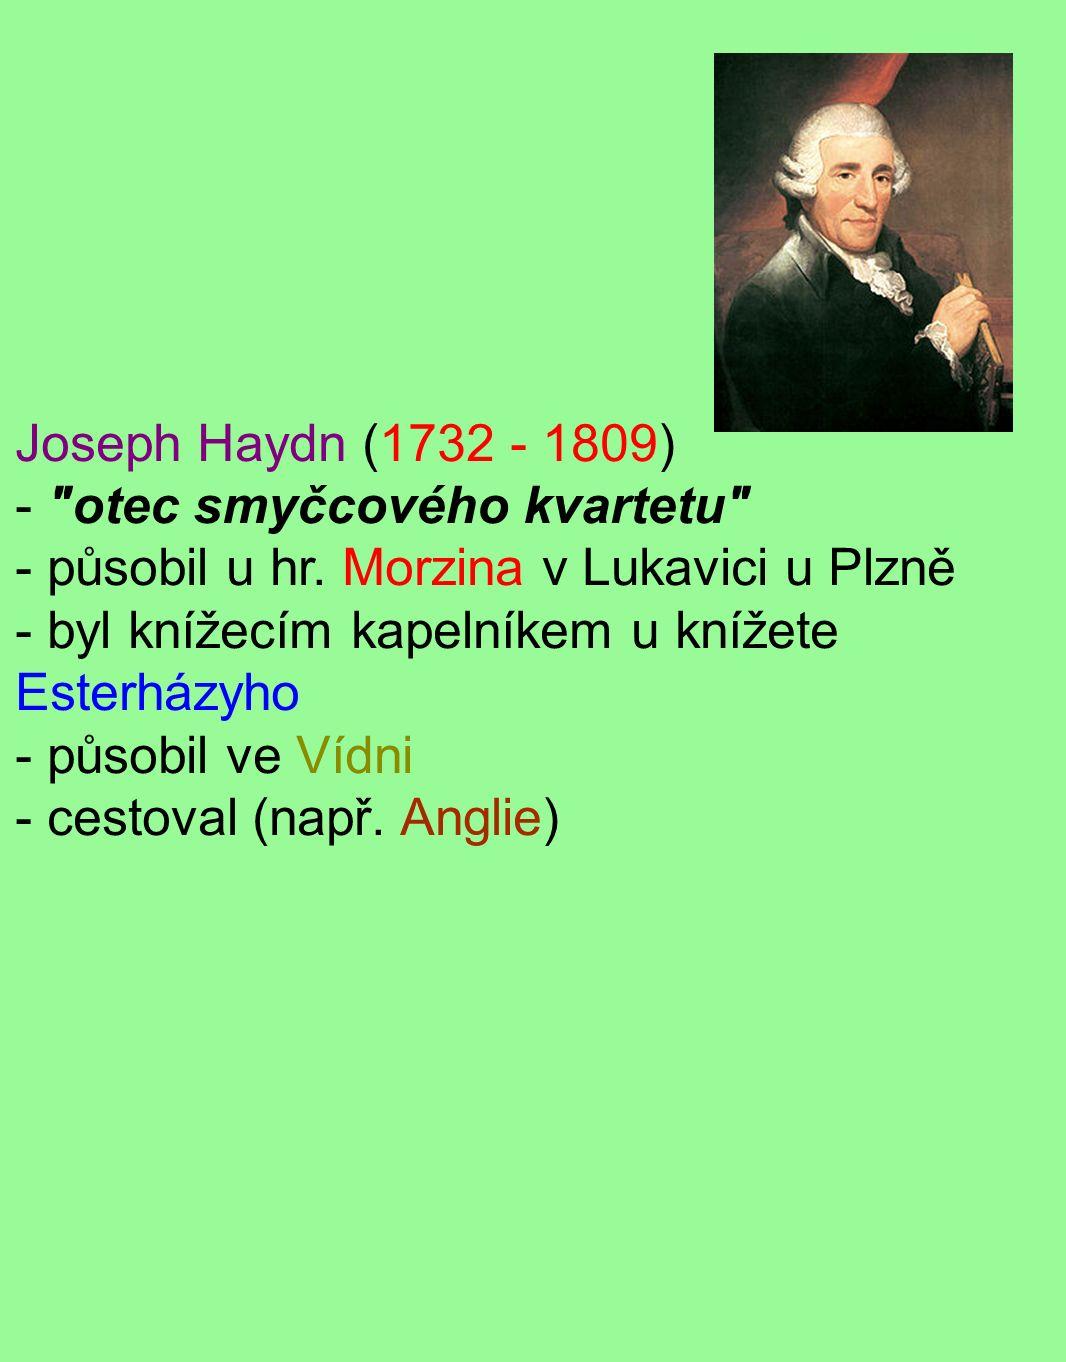 Joseph Haydn (1732 - 1809) -